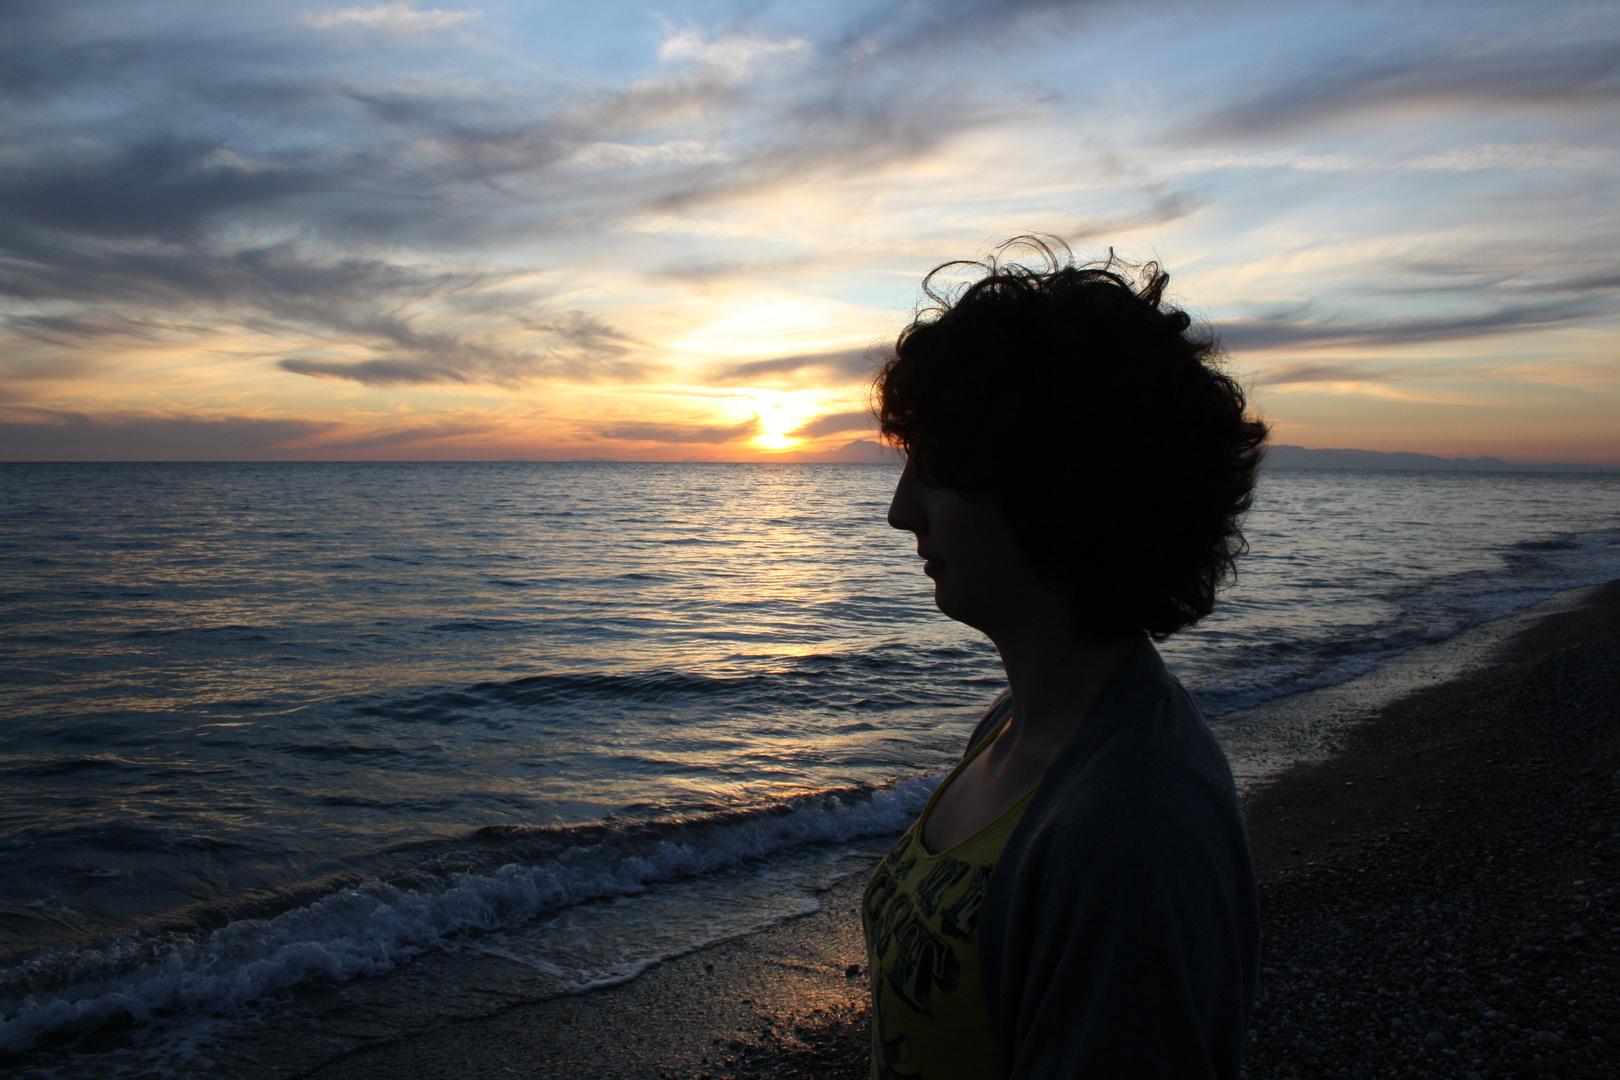 Profil im Sonnenuntergang